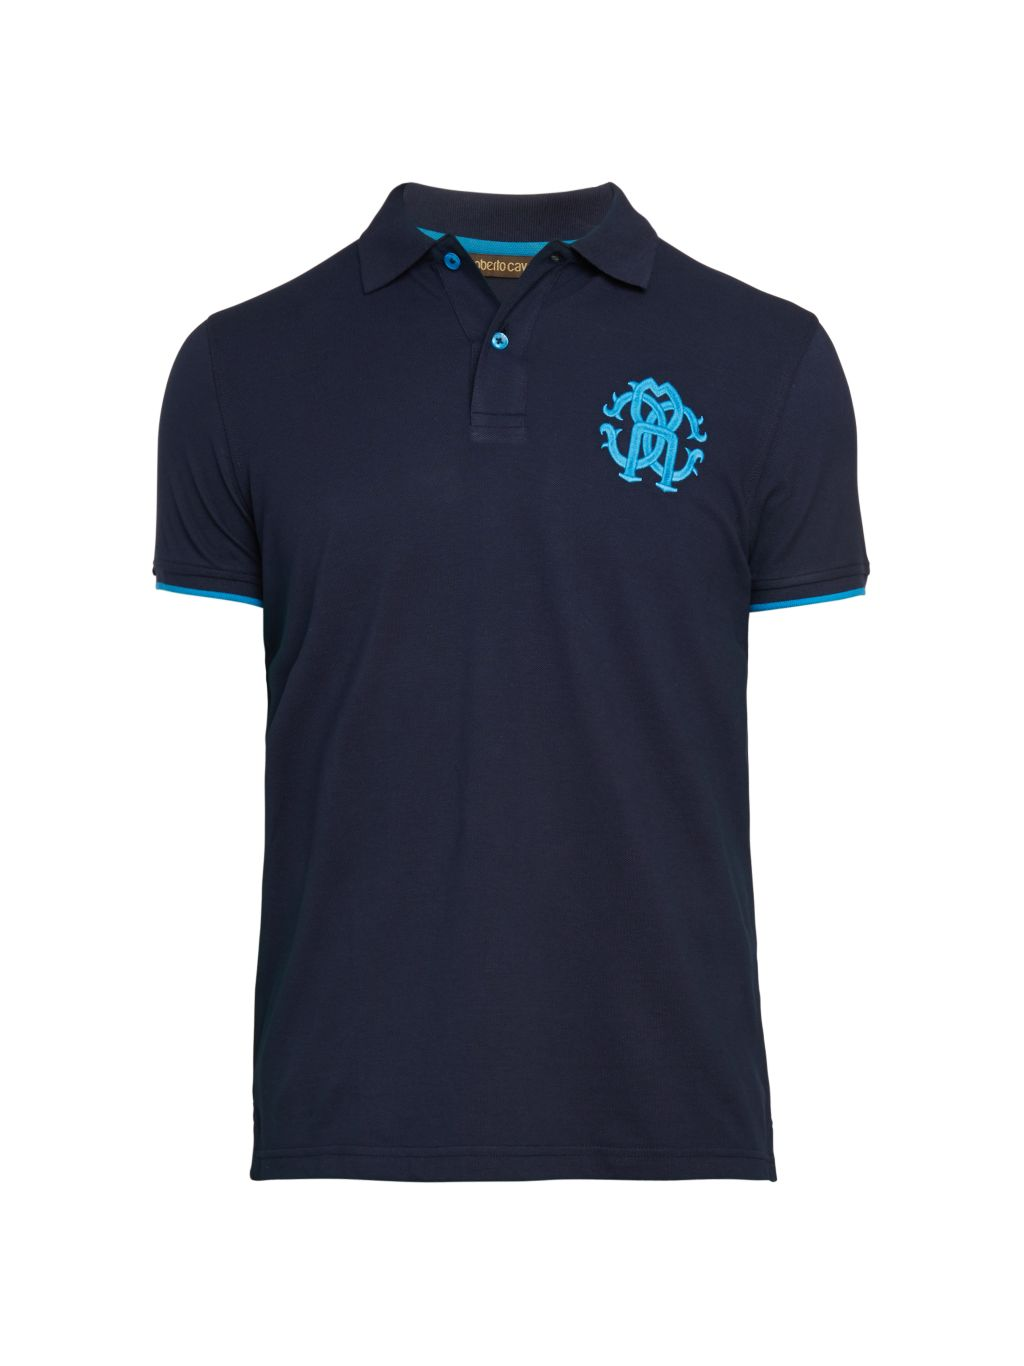 Roberto Cavalli Logo Crest Polo